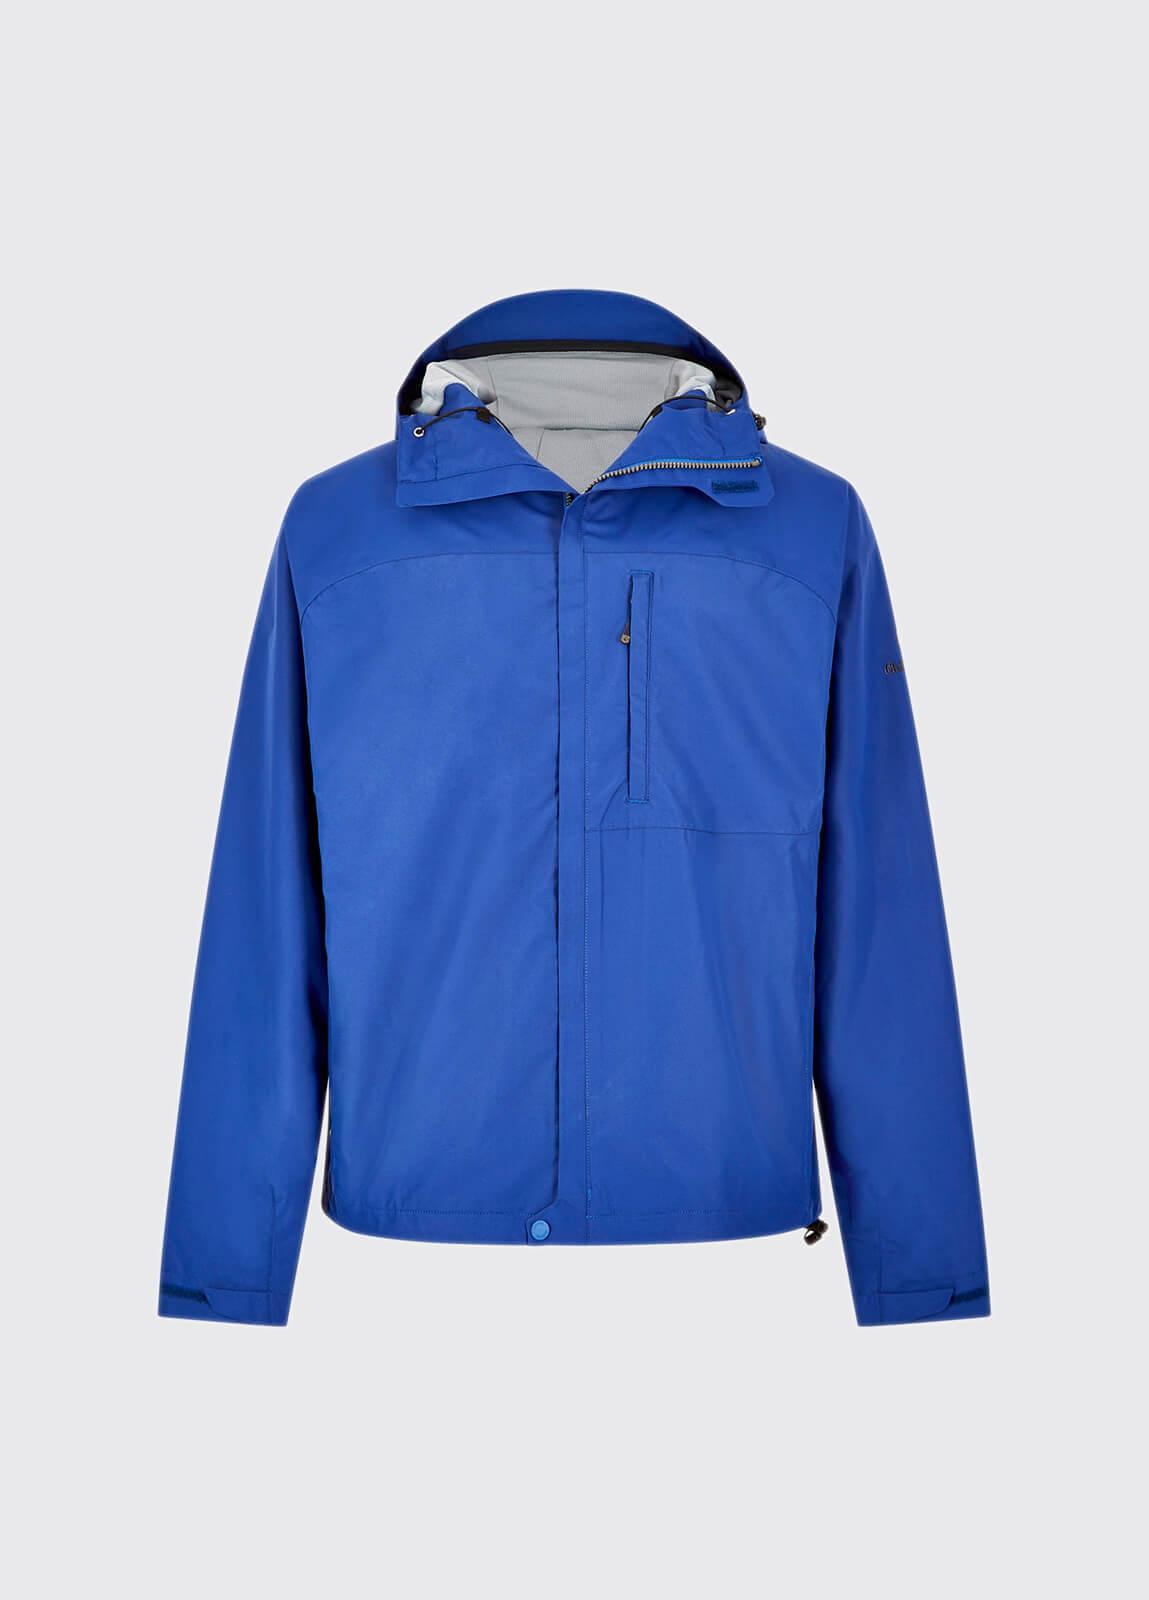 Ballycumber Jacket - Royal Blue